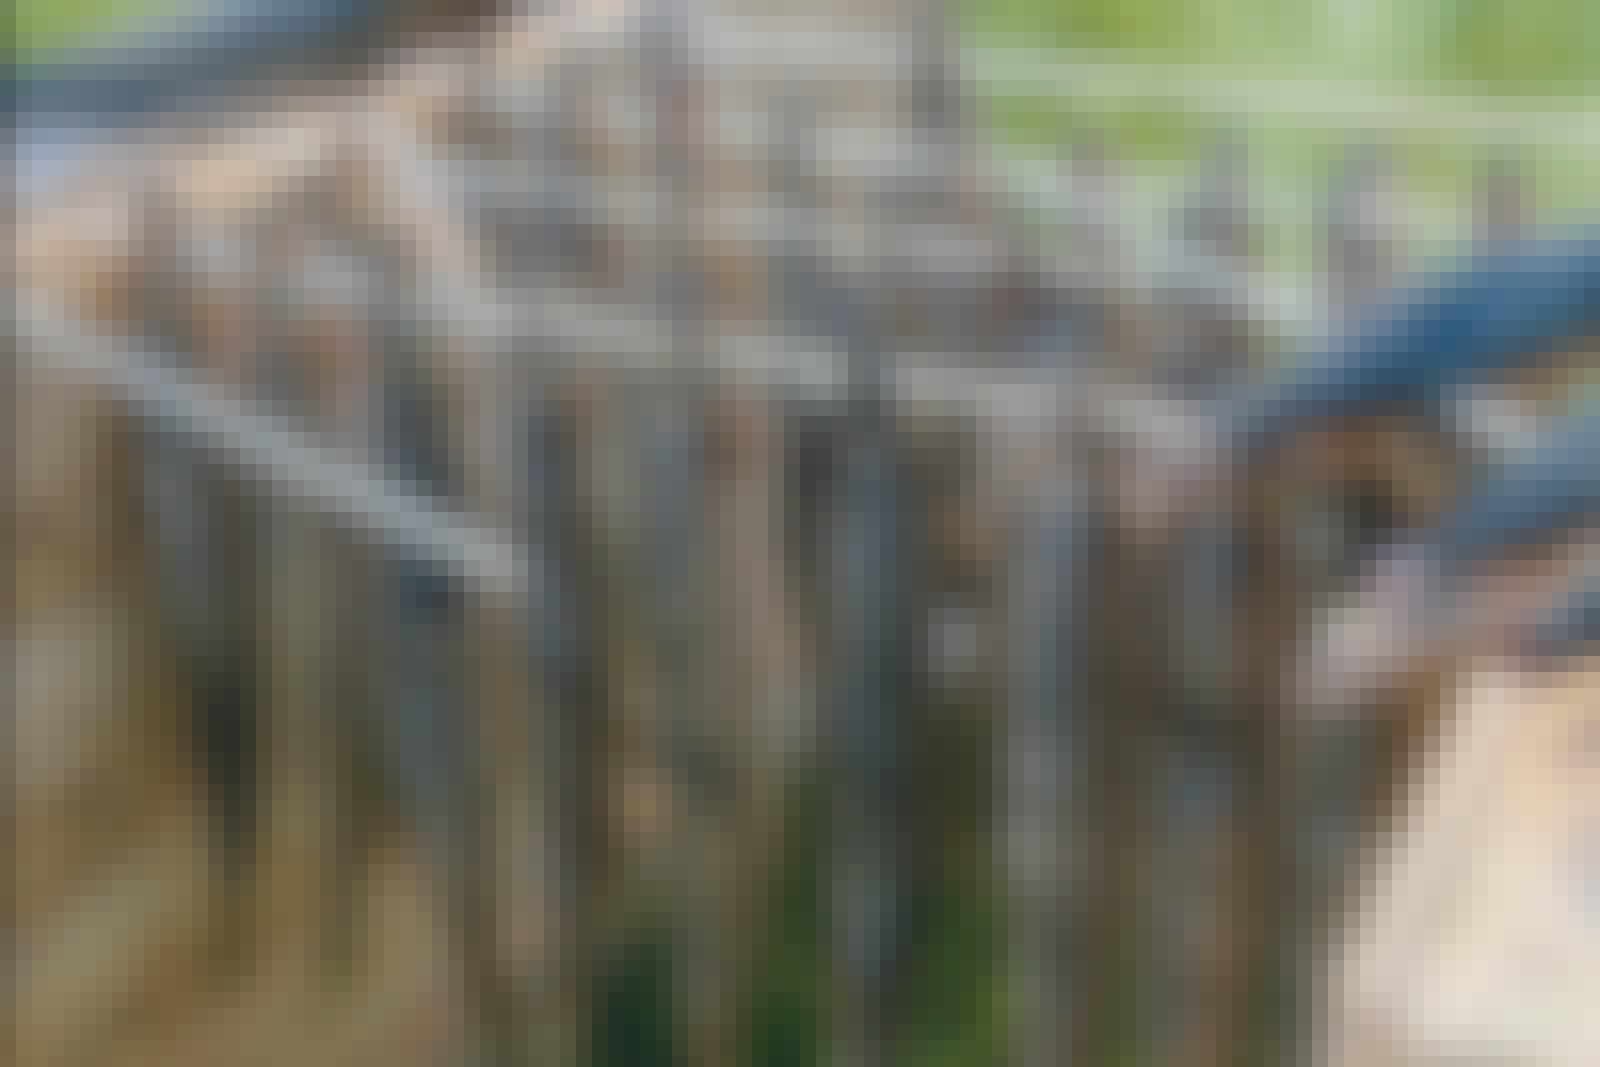 Røgeovn: Røgning i røgeovn